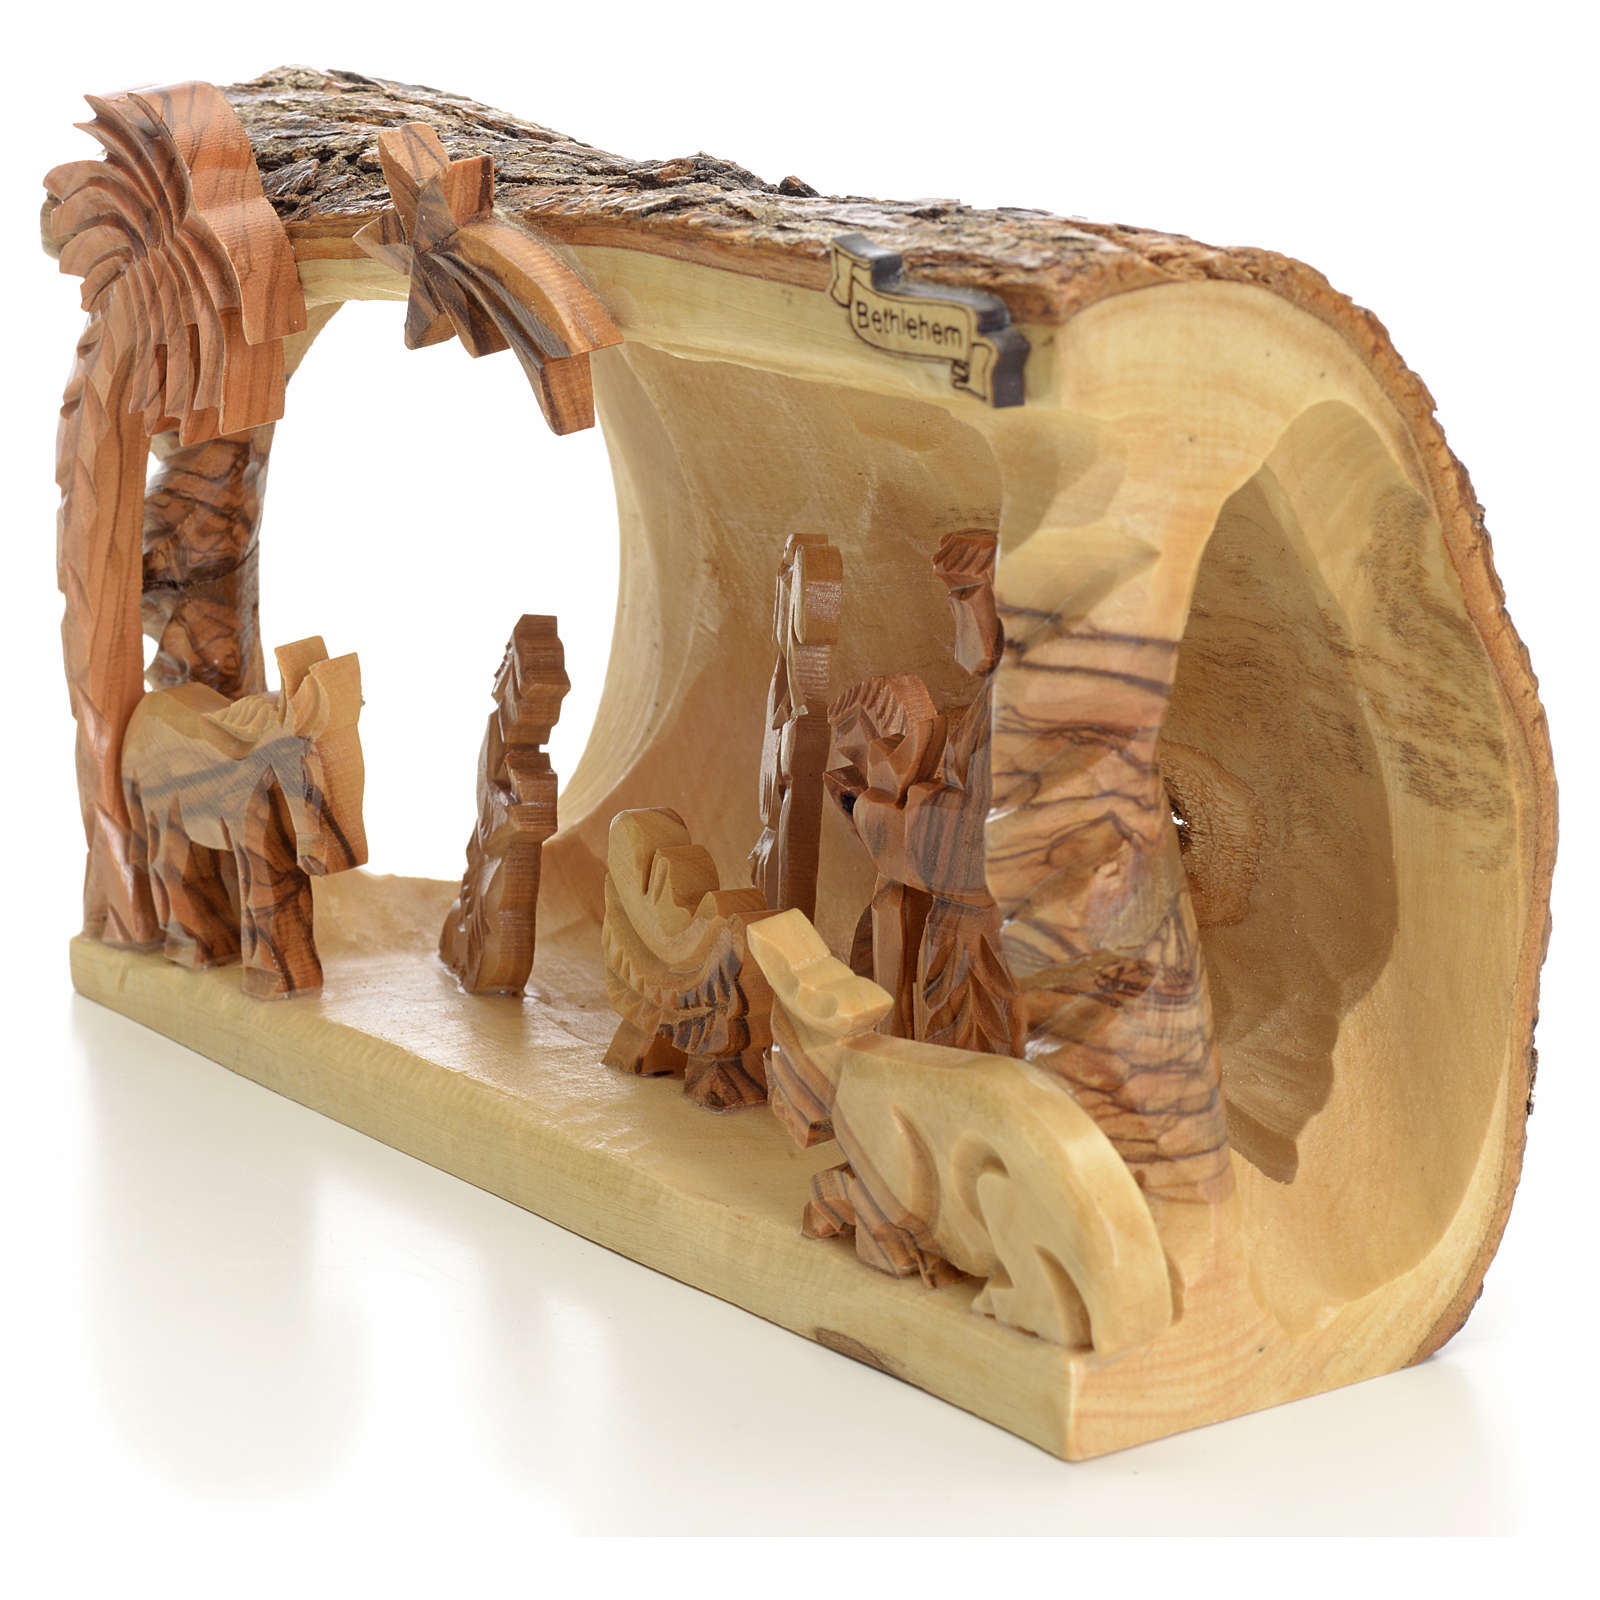 Nativity Scene Holy Land Olive Tree In Log Online Sales